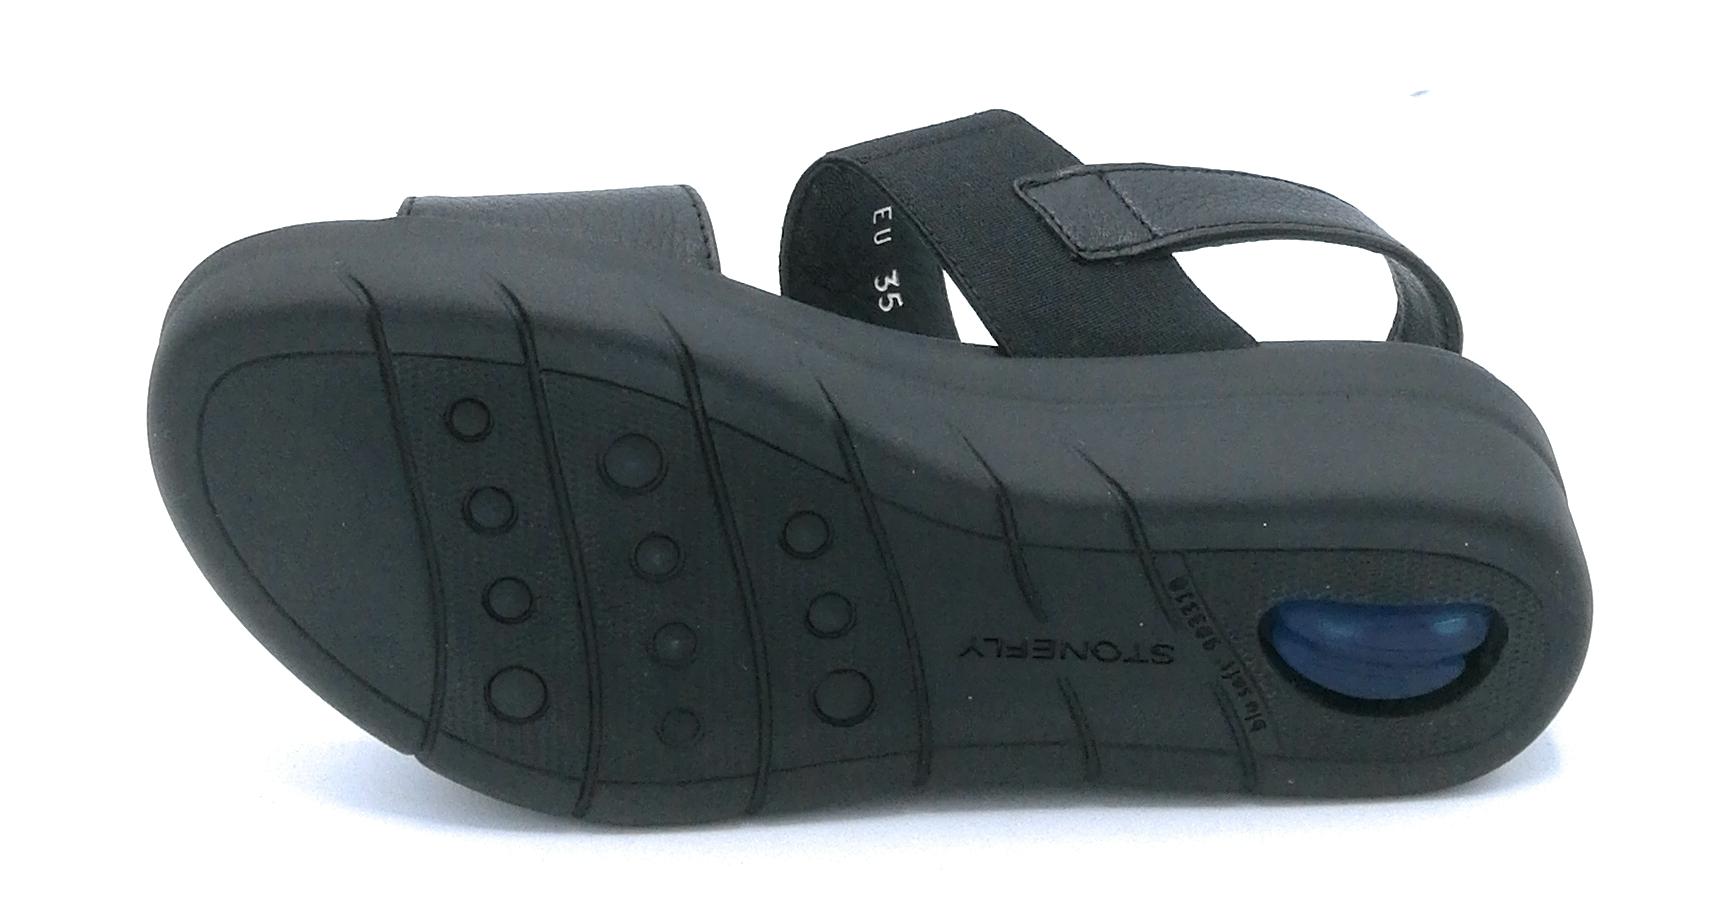 Cinturino Stonefly Pelle 210854 Nero Dshqrct Elastico Rosso Sandalo SpqzMUV